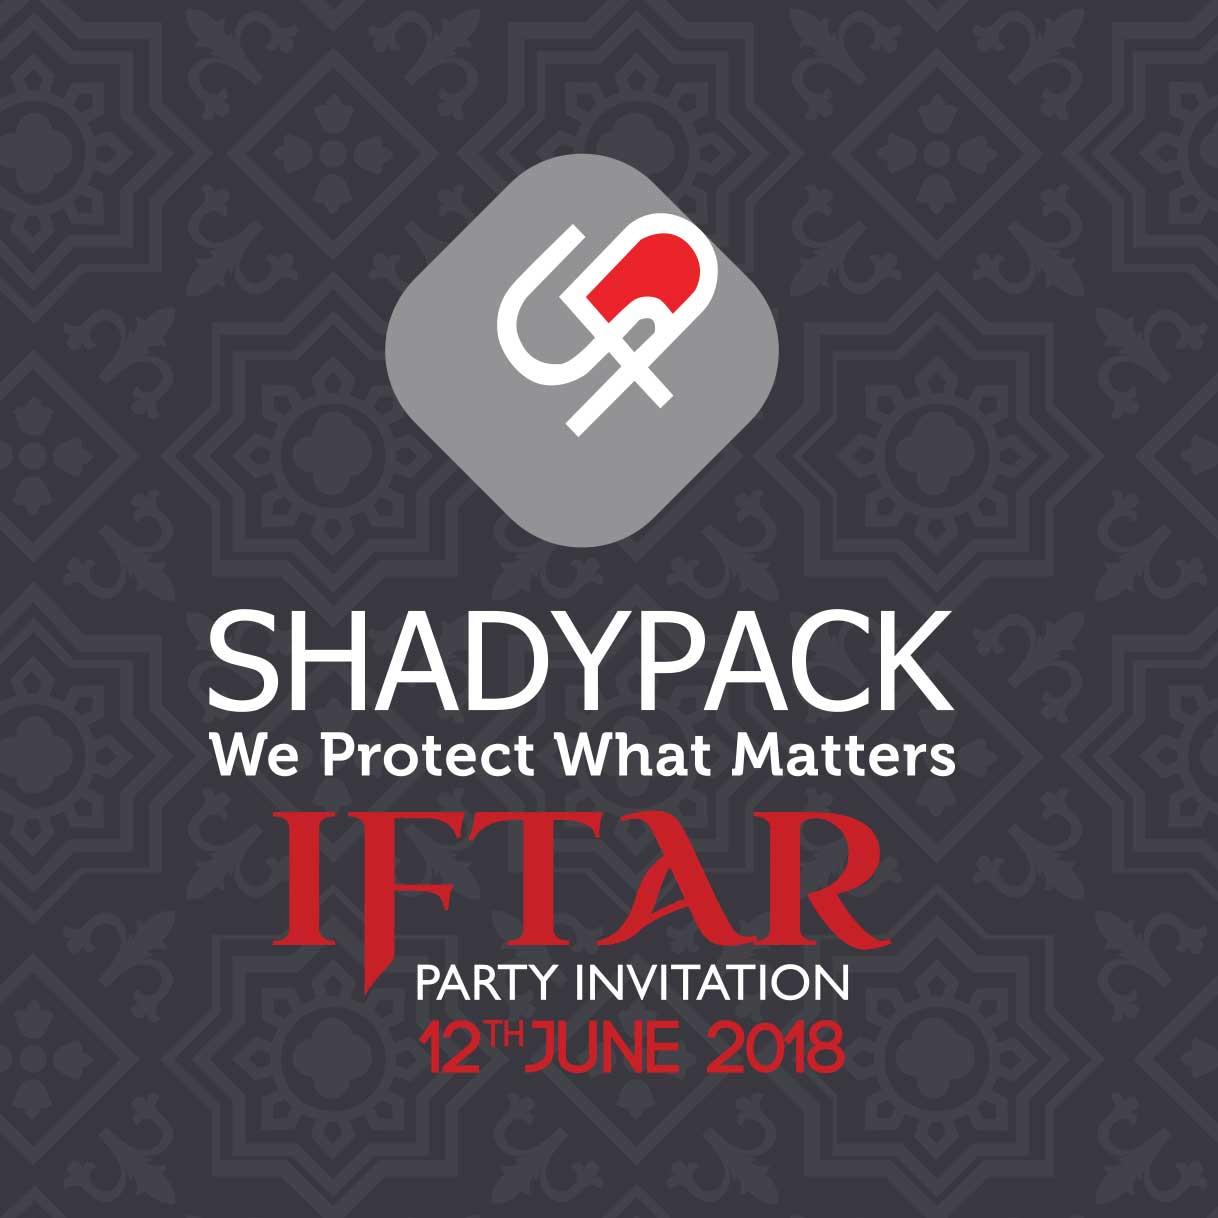 SHADYPACK ANNUAL RAMADAN IFTAR 2018